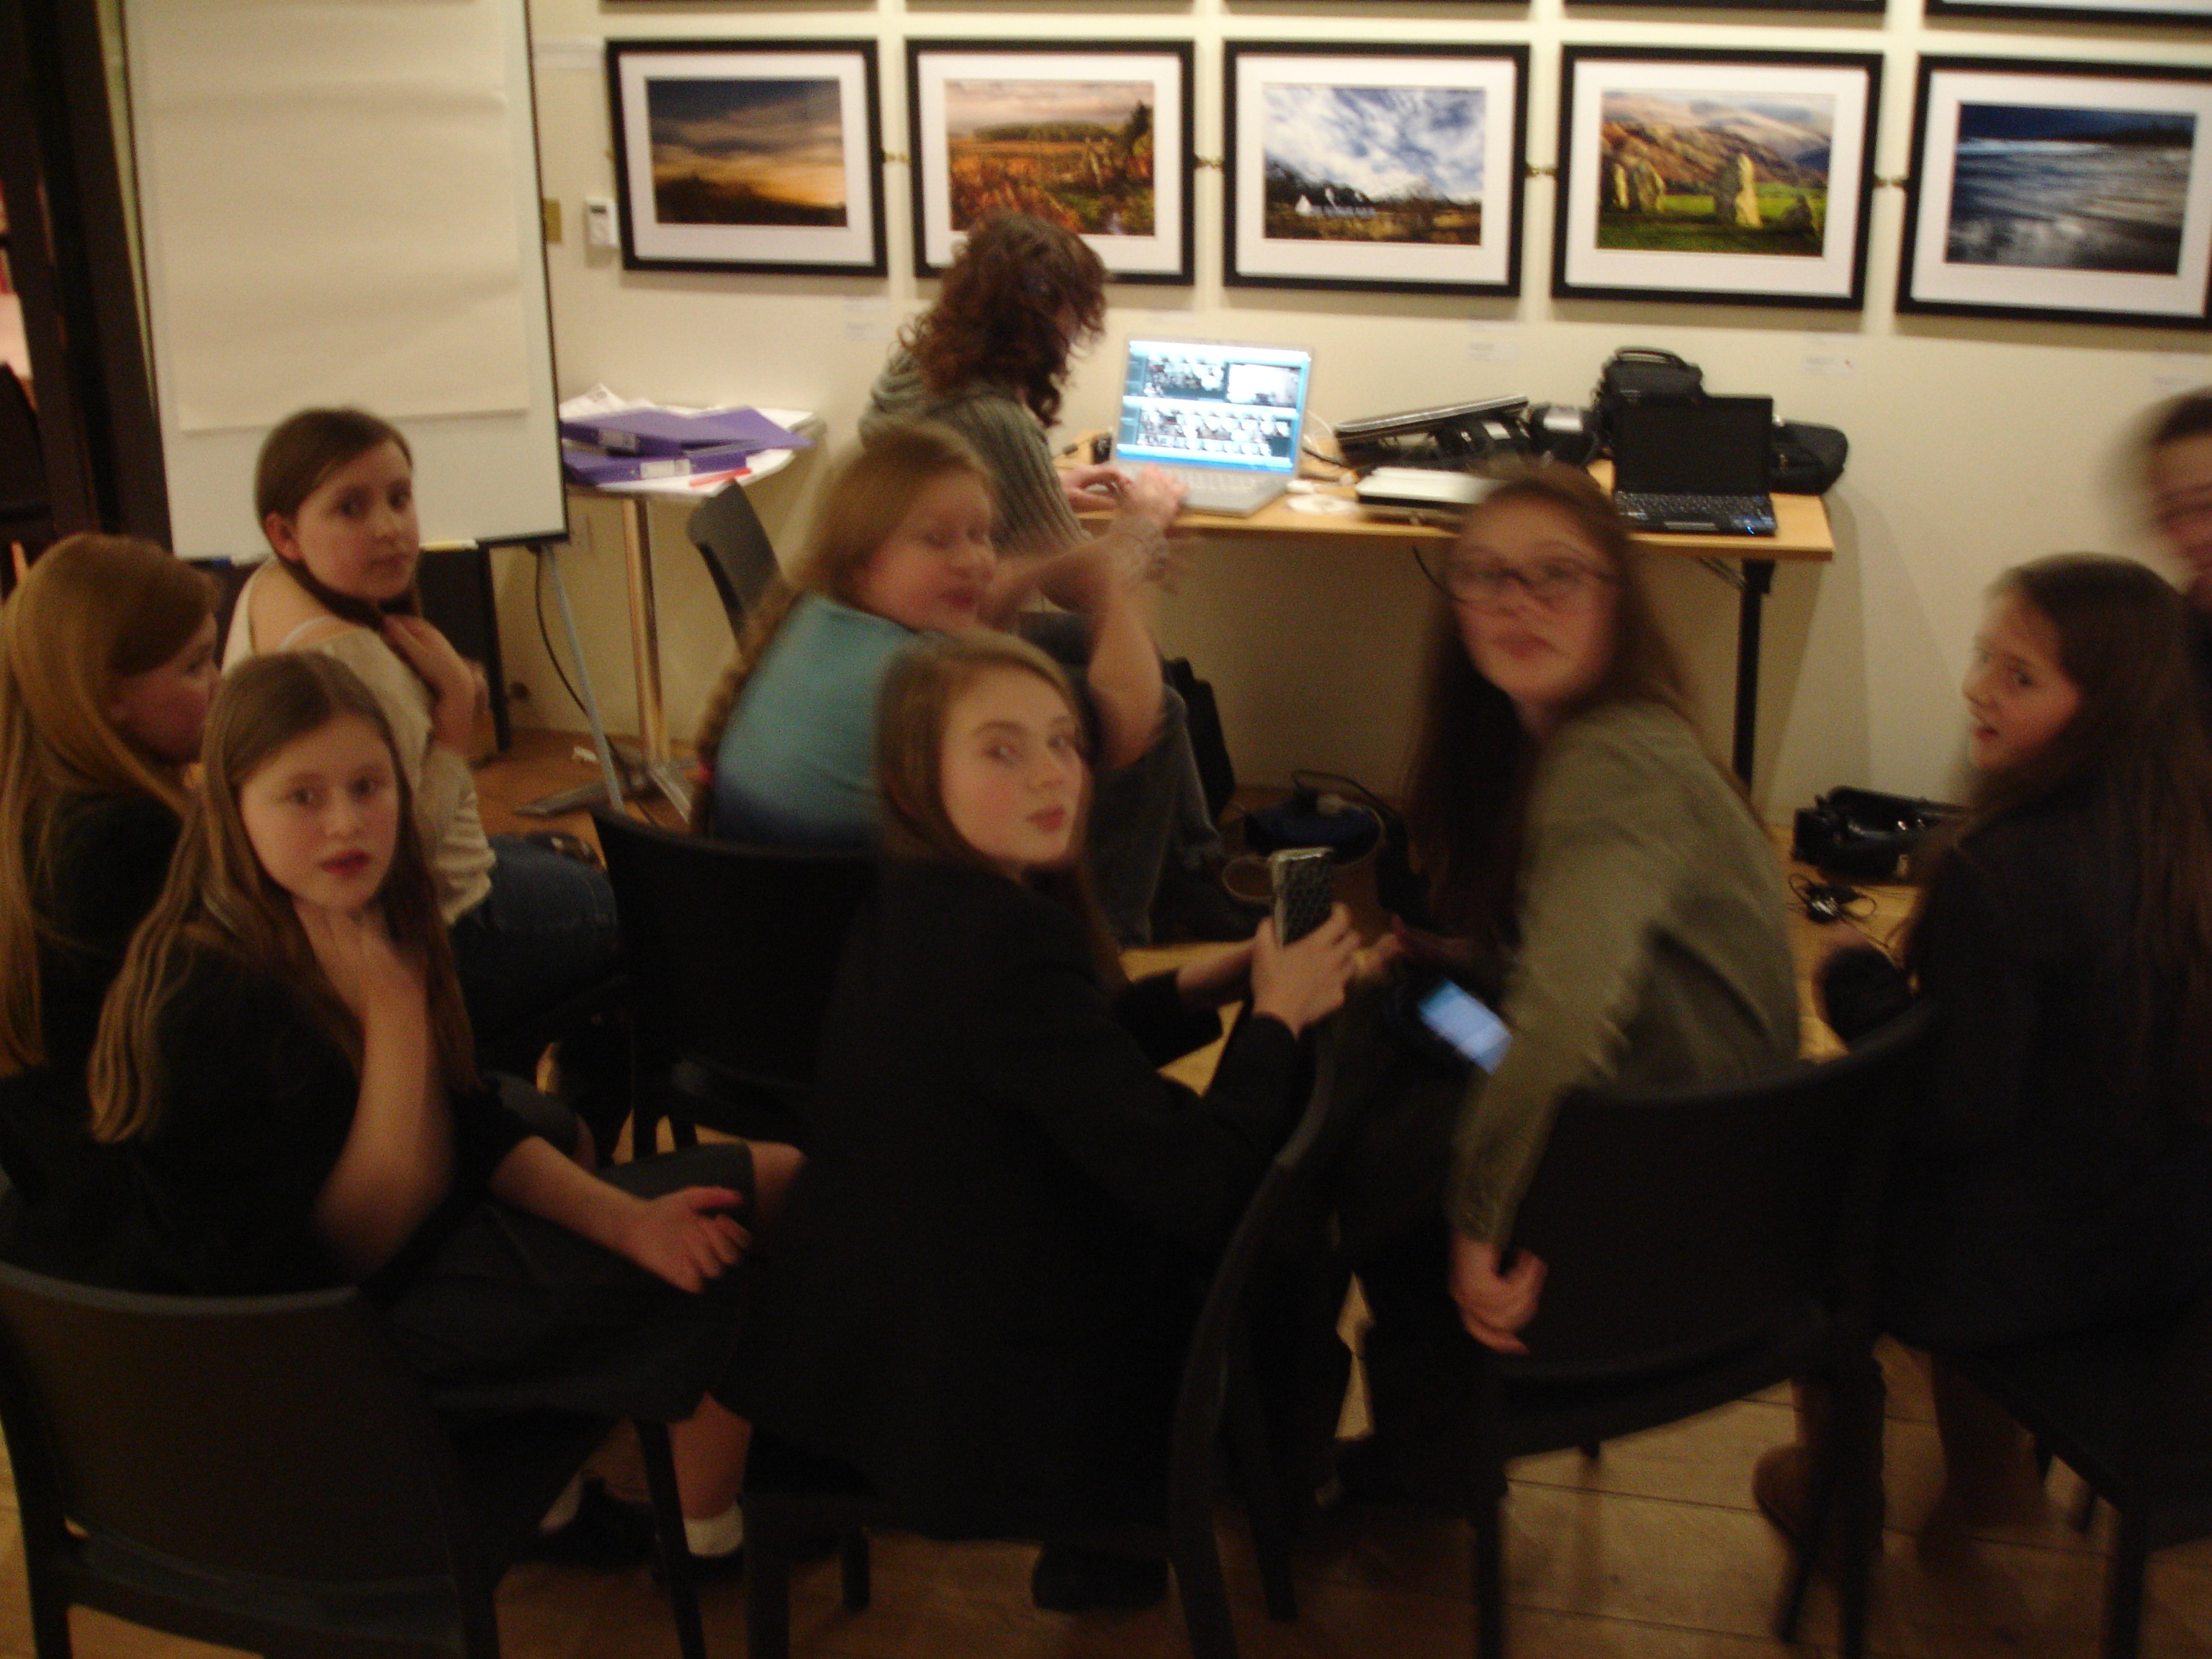 Caistories Film Making Workshop - Week 1